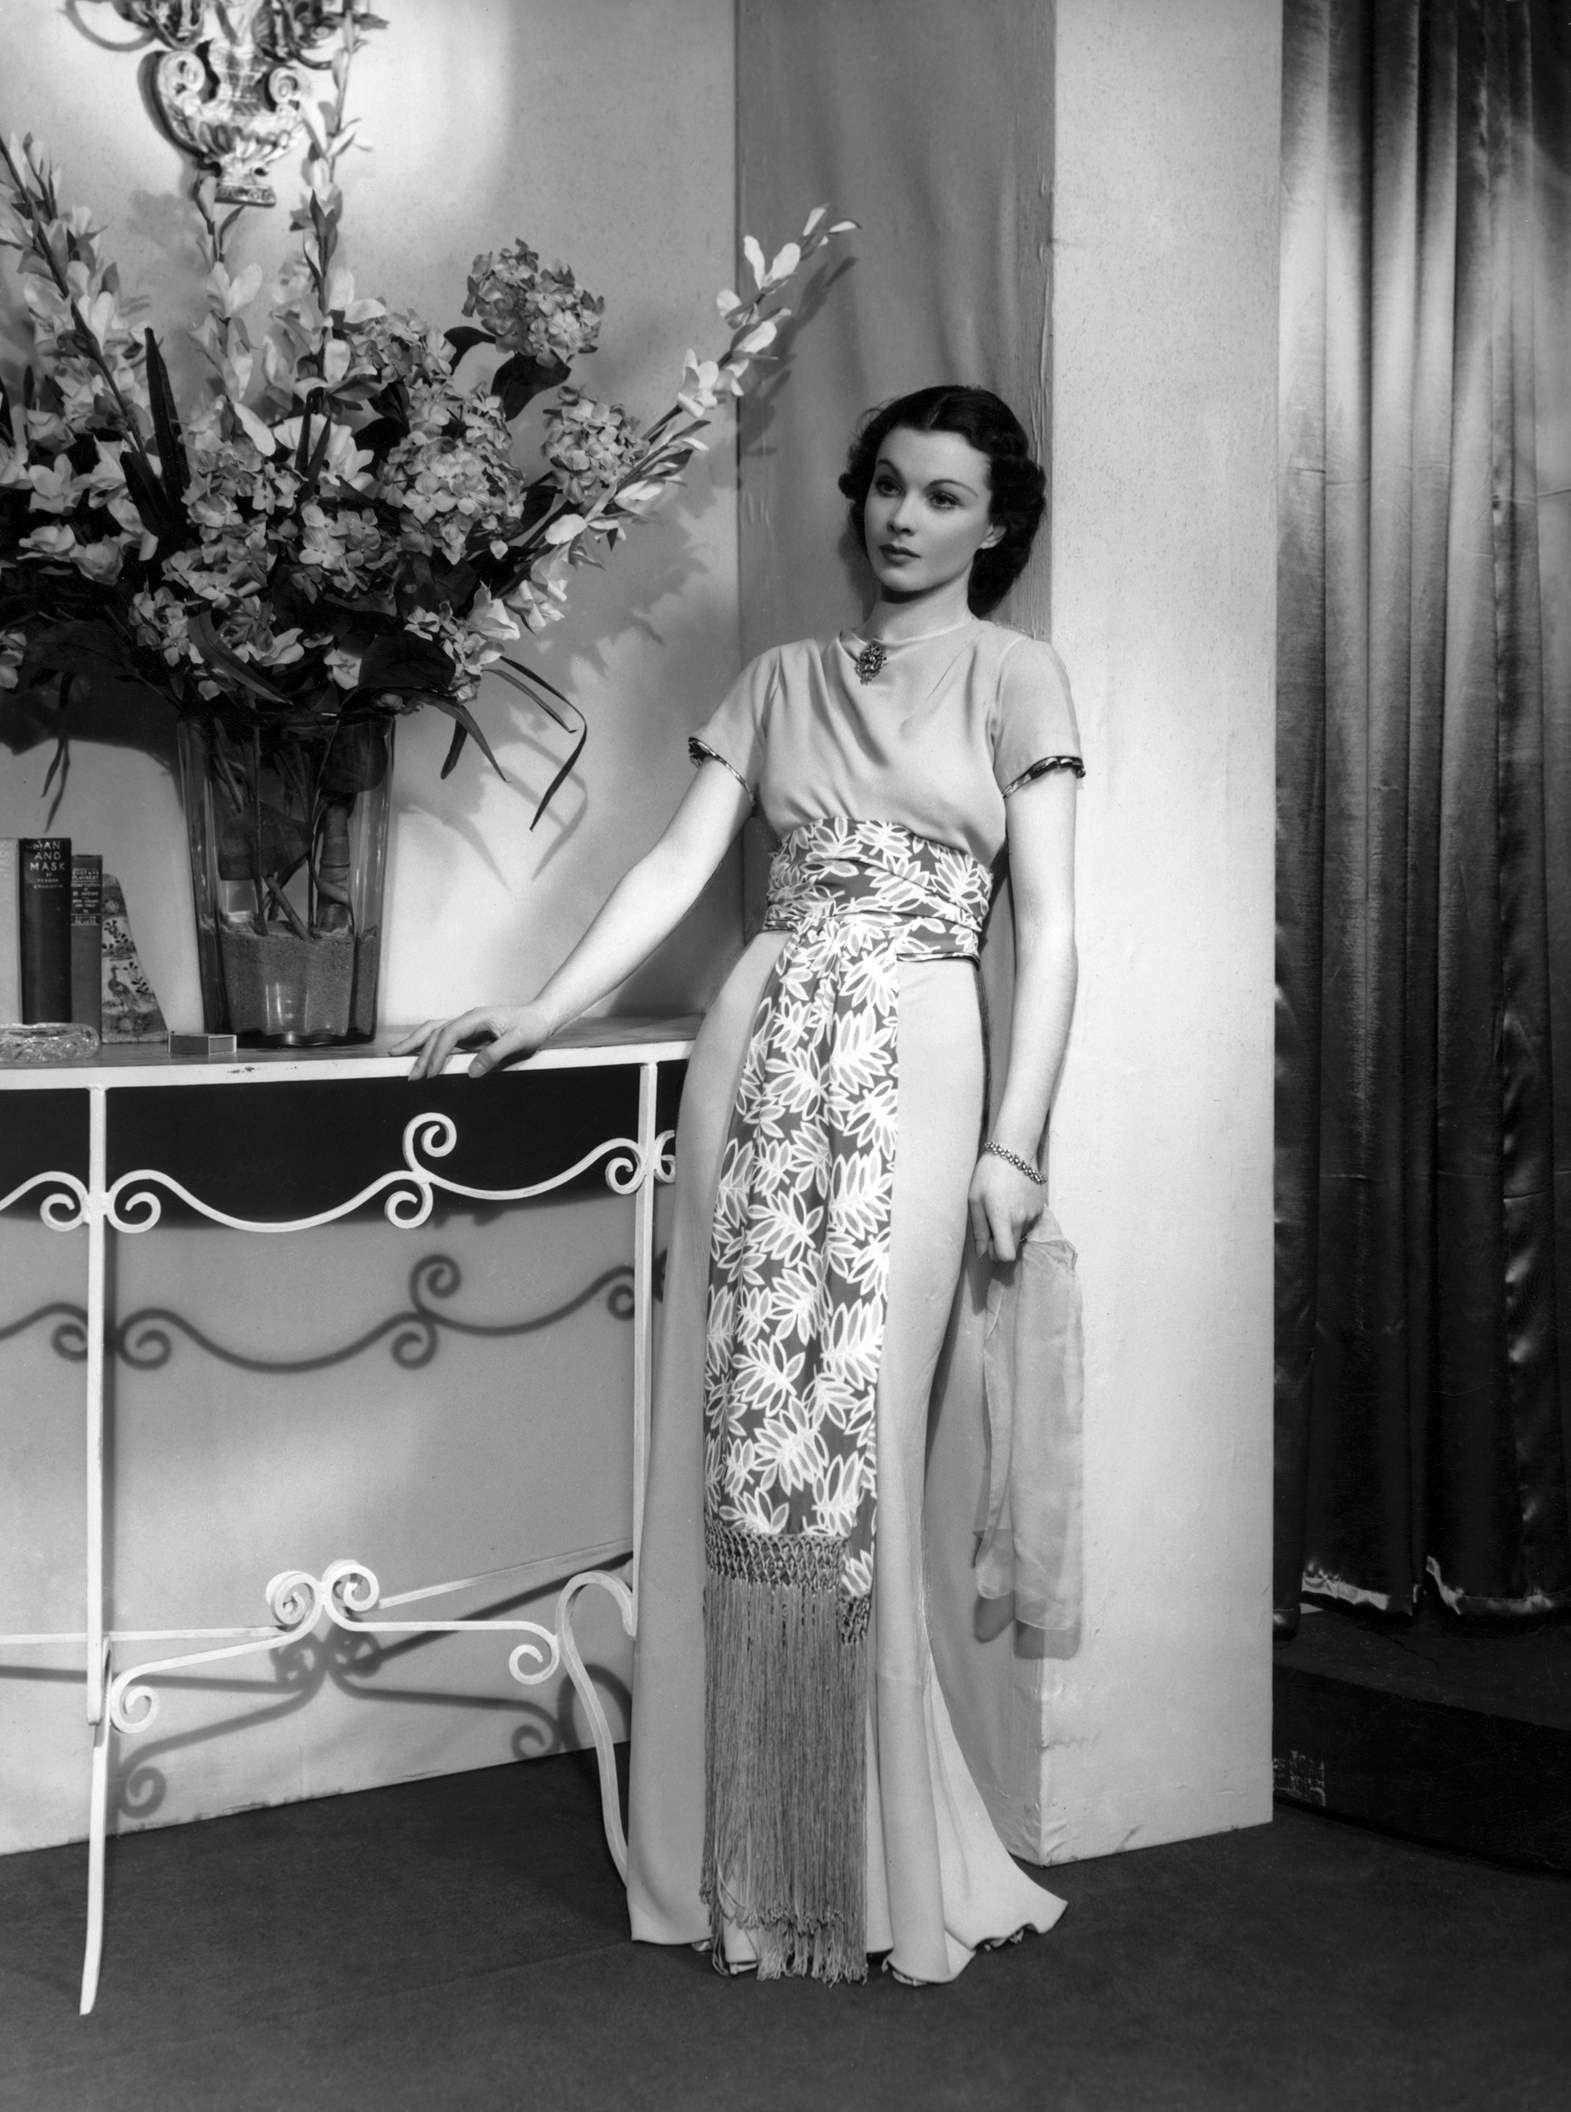 Vivien Leigh sash dress